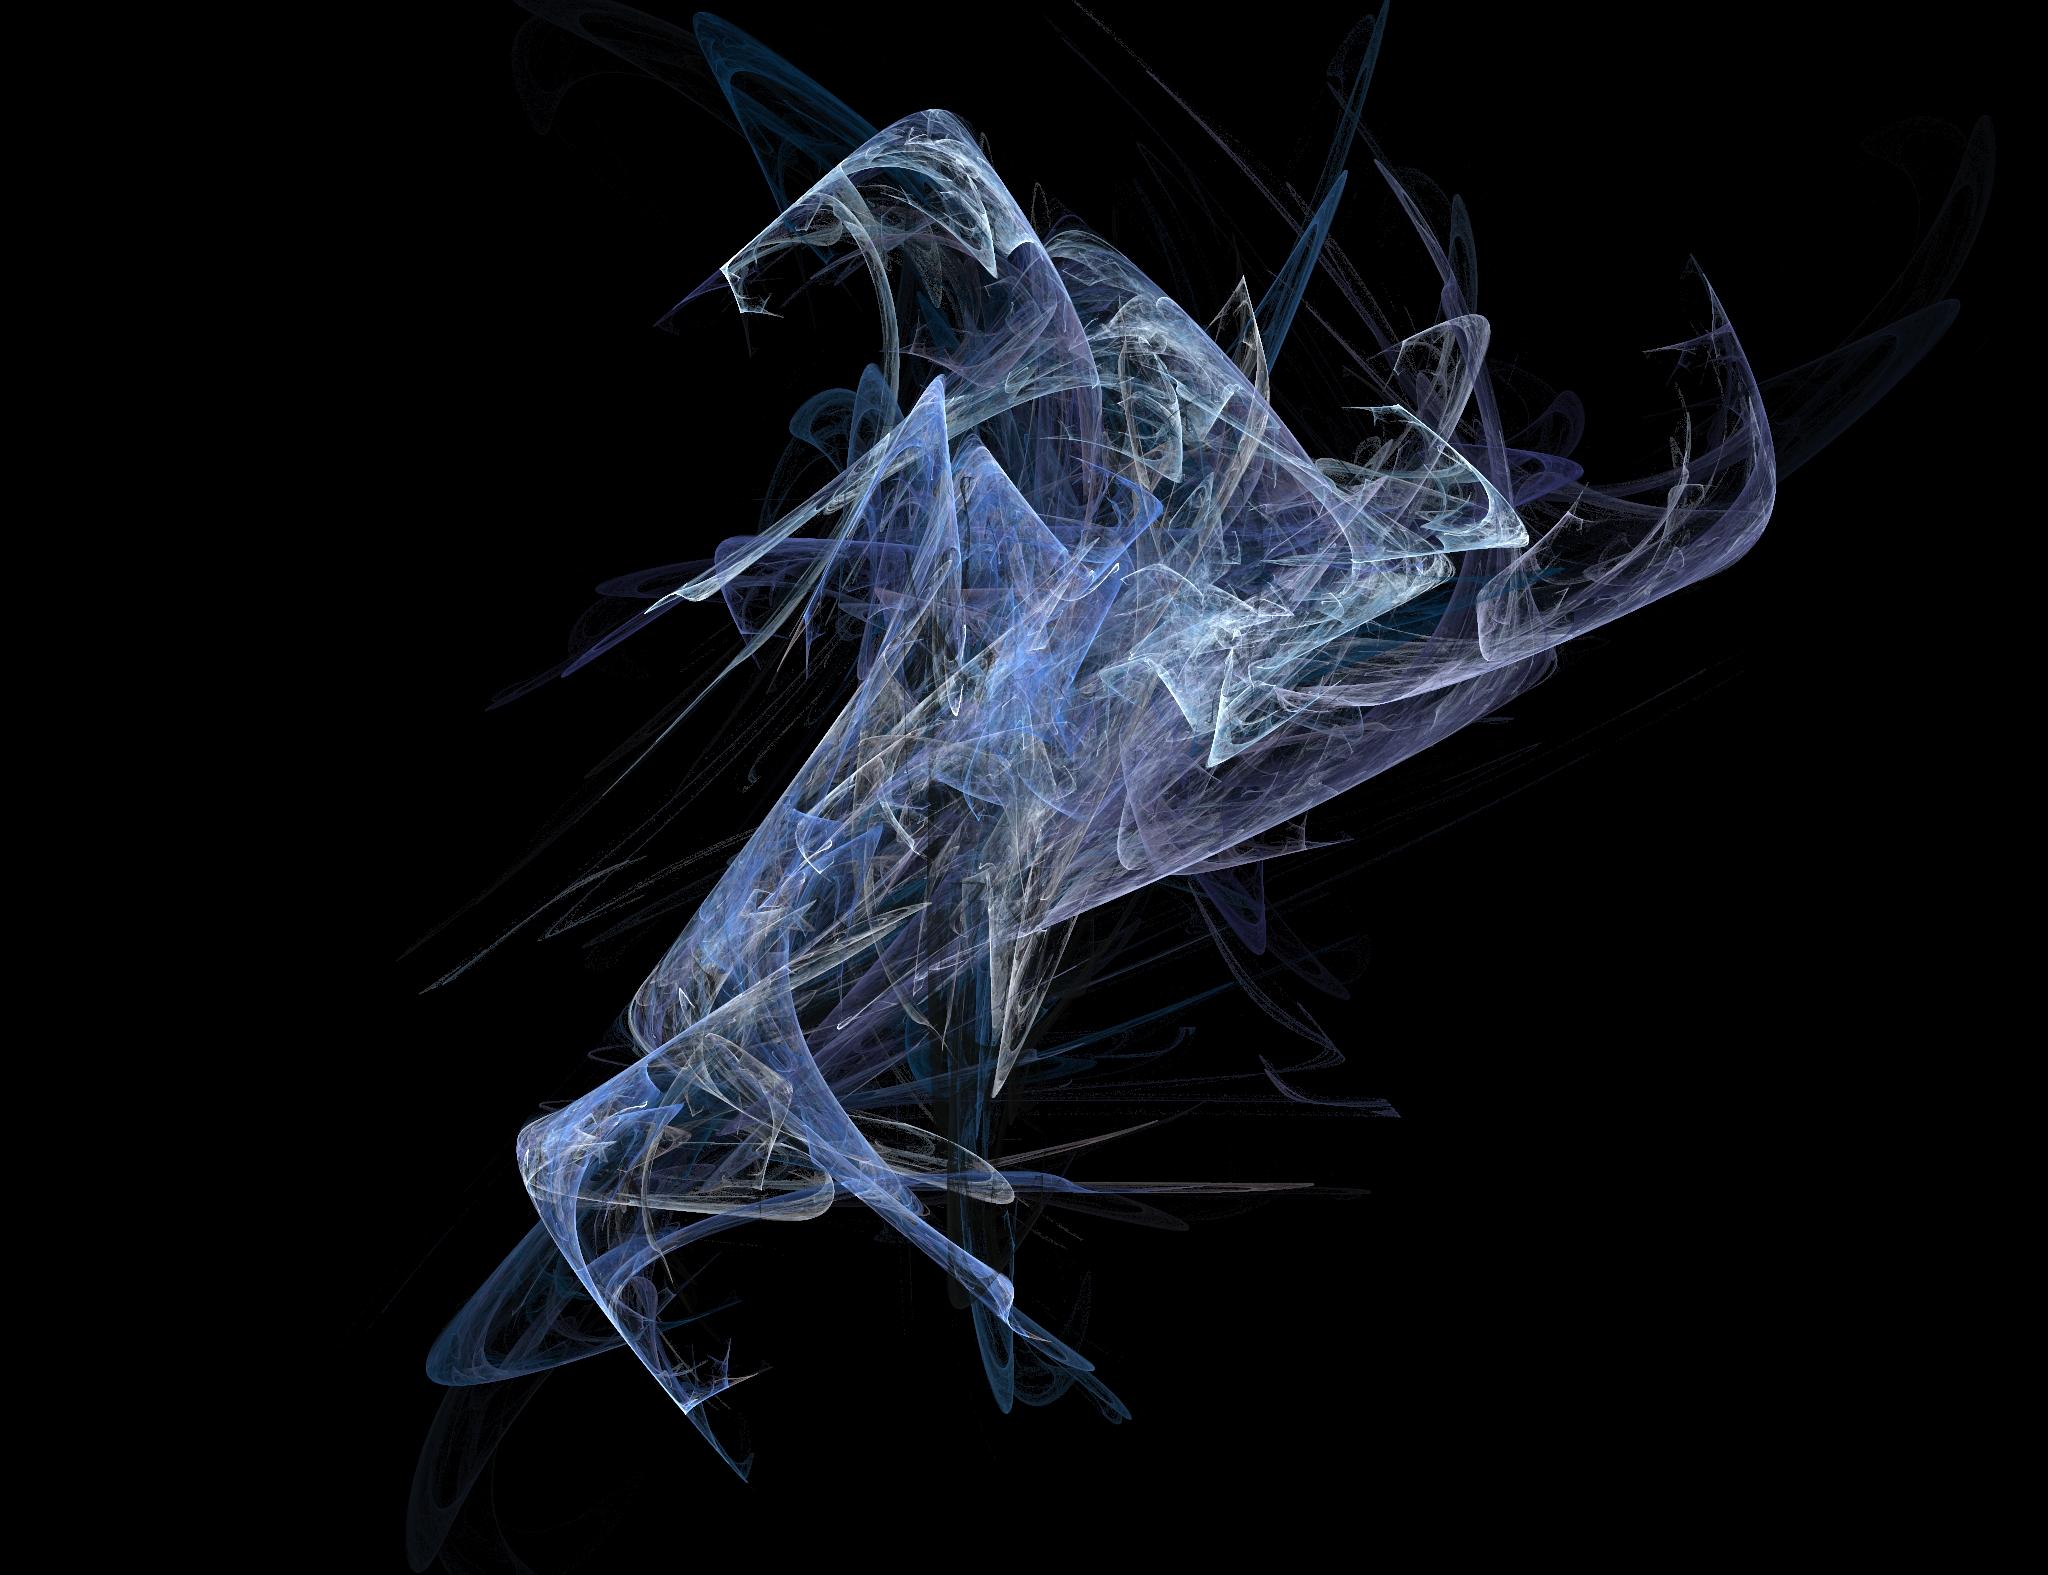 Blade_Apophysis_Fractal_Flame.jpg